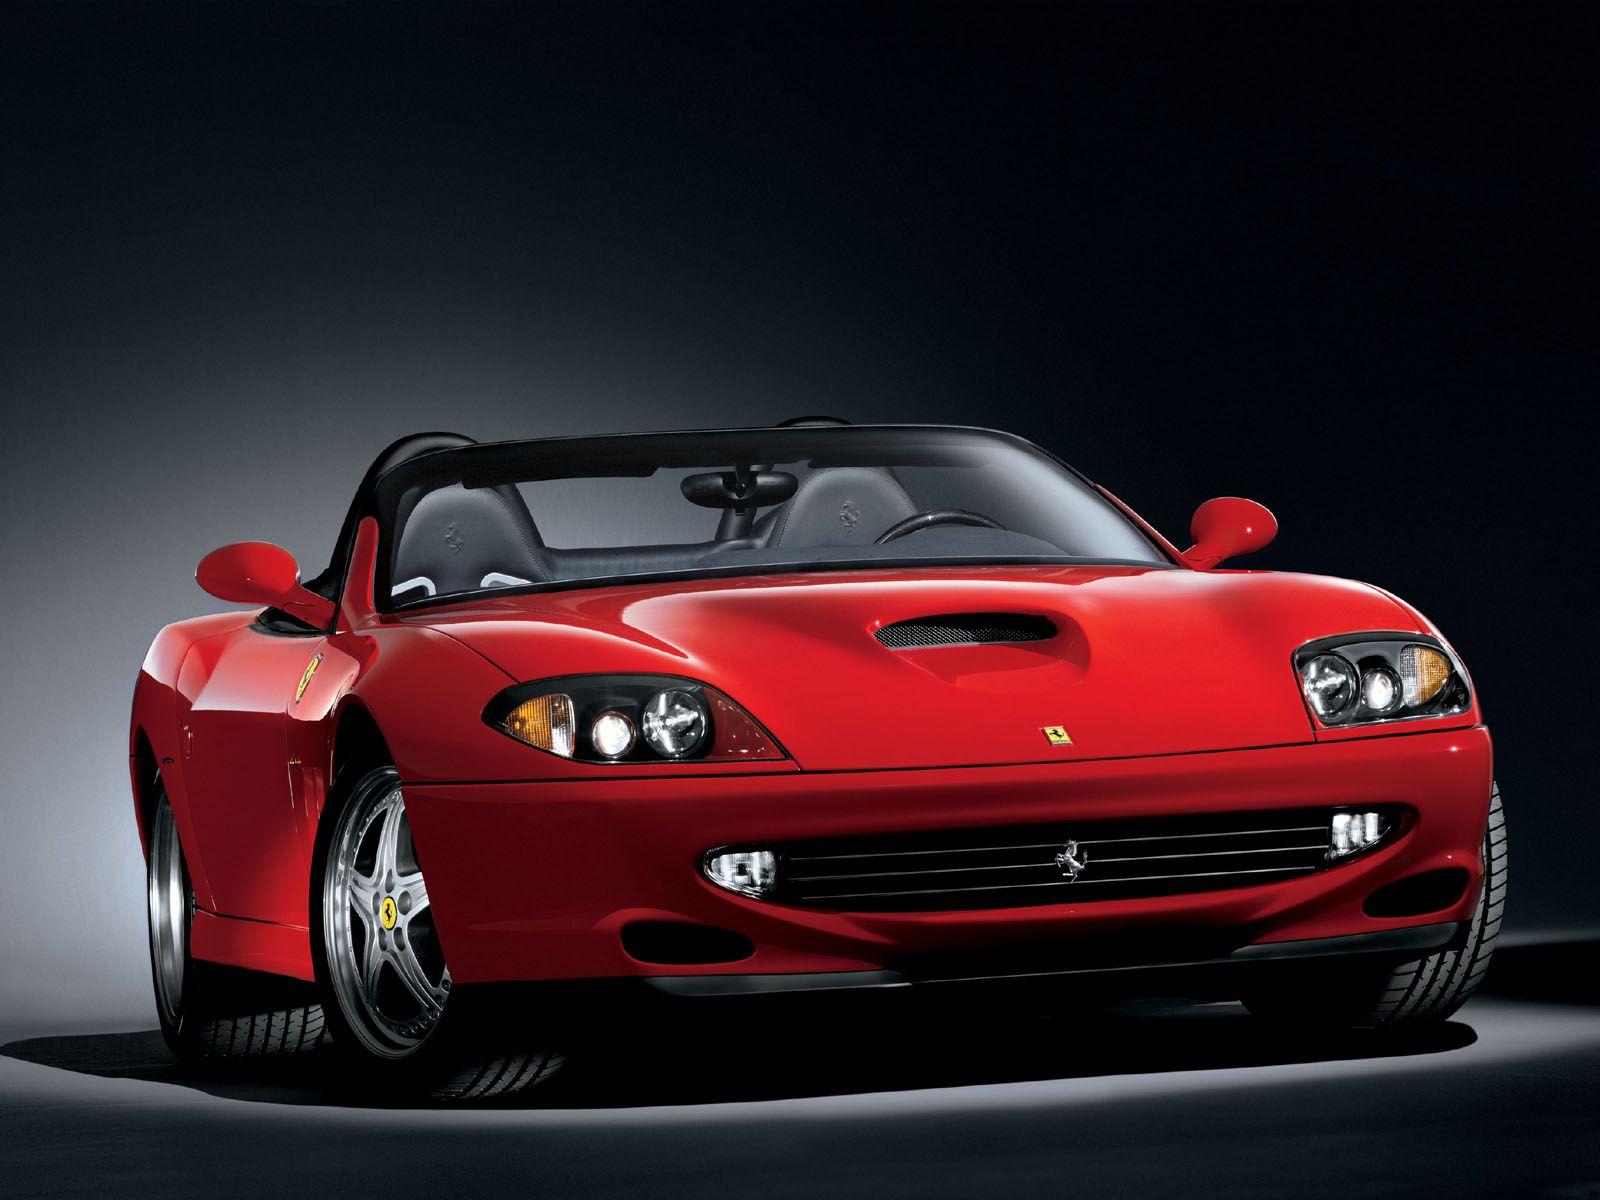 Delightful Wallpaper : Sports Car, Ferrari F50, Ferrari 550 Maranello, Netcarshow,  Netcar, Car Images, Car Photo, 2011, 550 Maranello Barchetta By  Pininfarina, ...